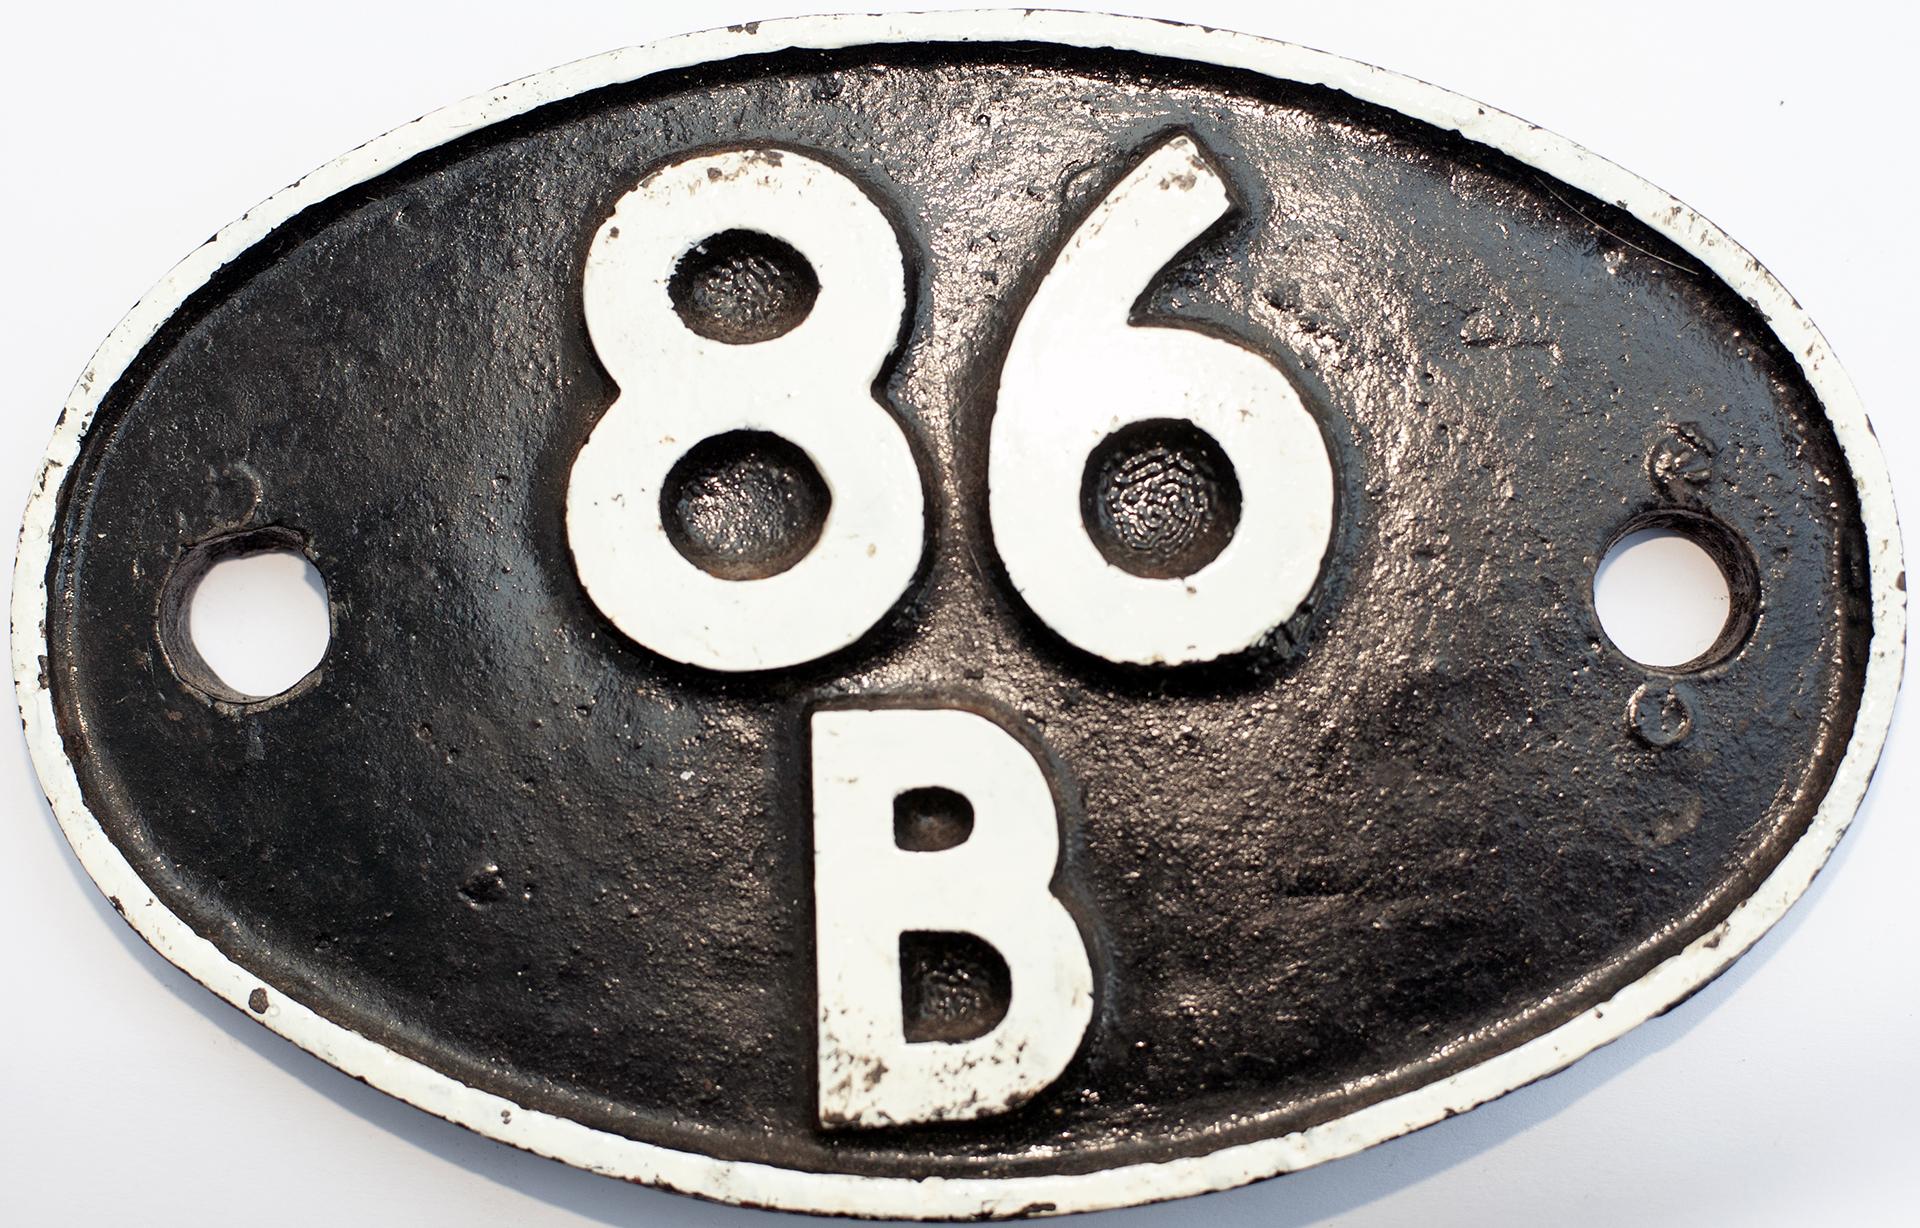 Shedplate 86b Newport Pill 1950-1963 And Newport